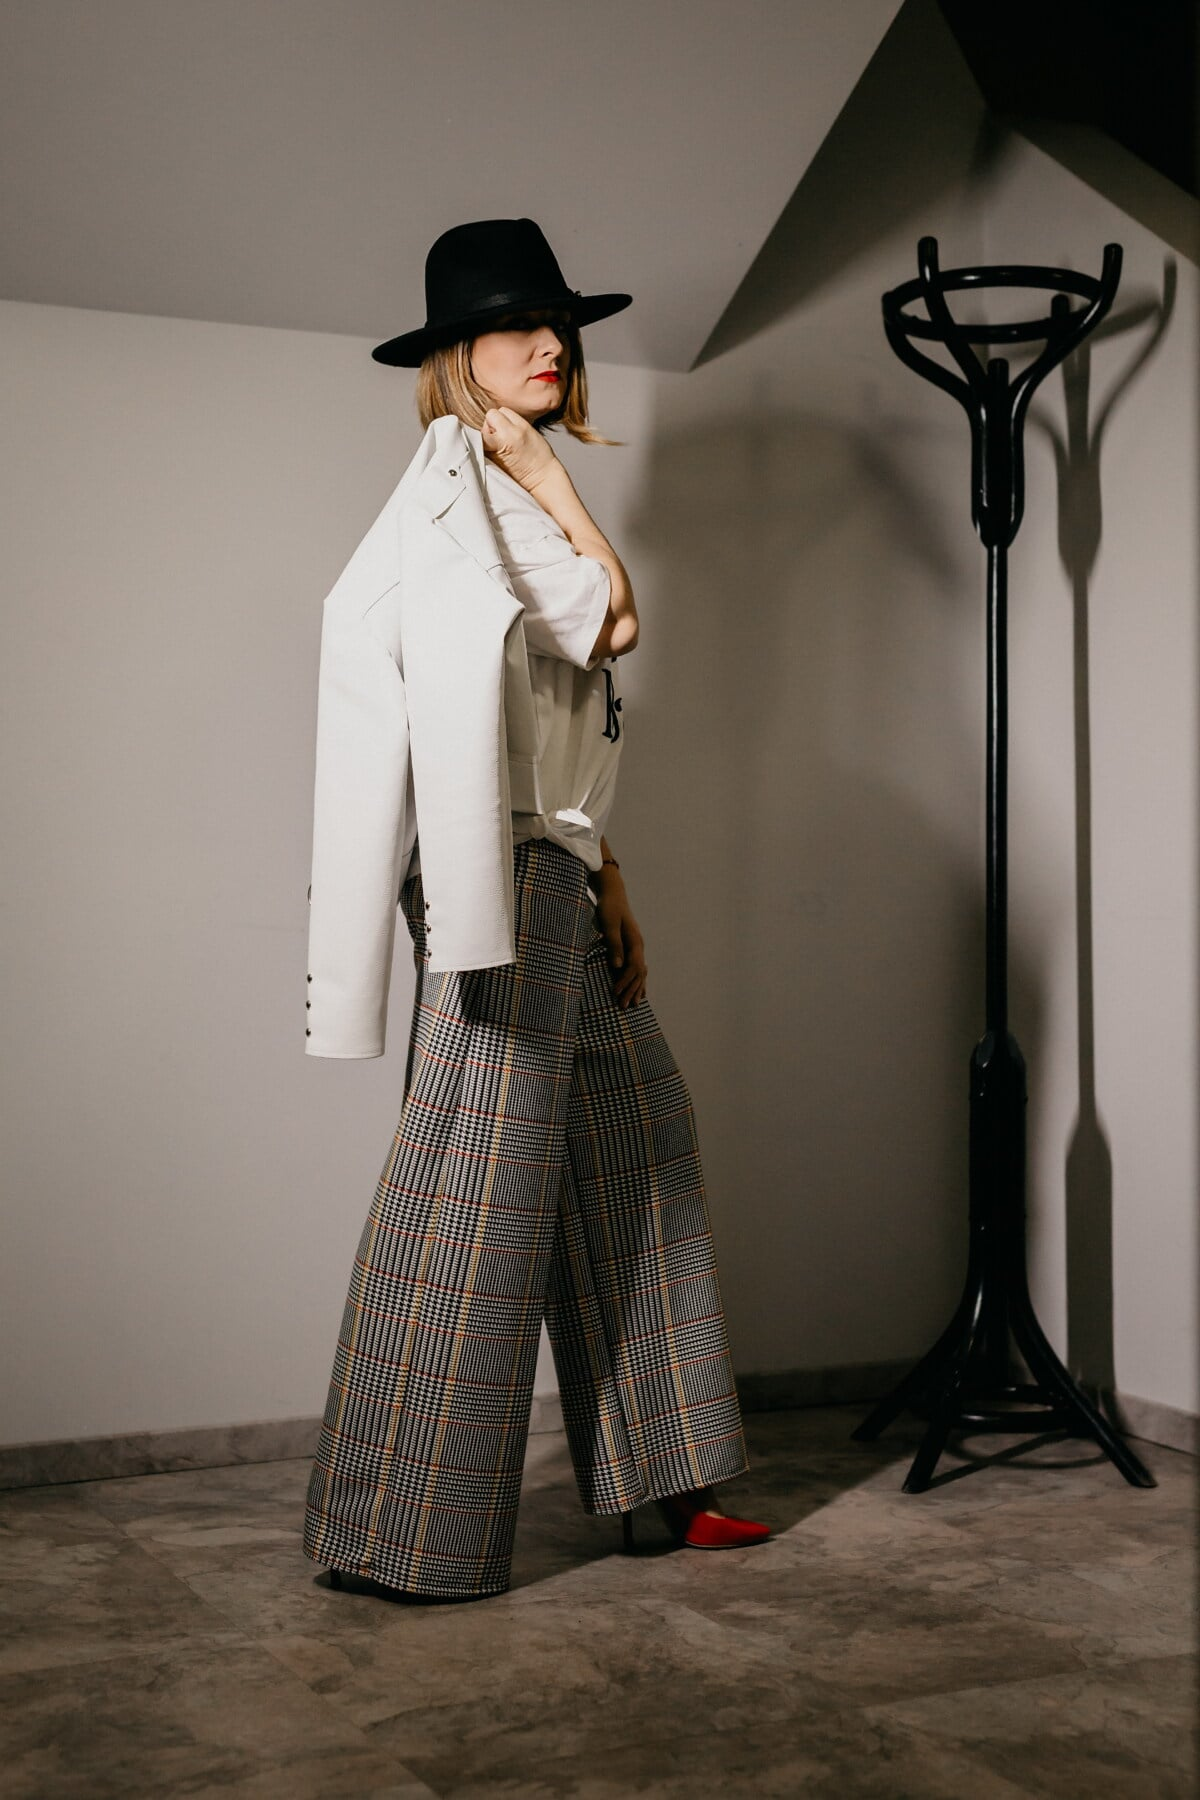 businesswoman, outfit, hat, black, white, coat, fashion, garment, model, girl